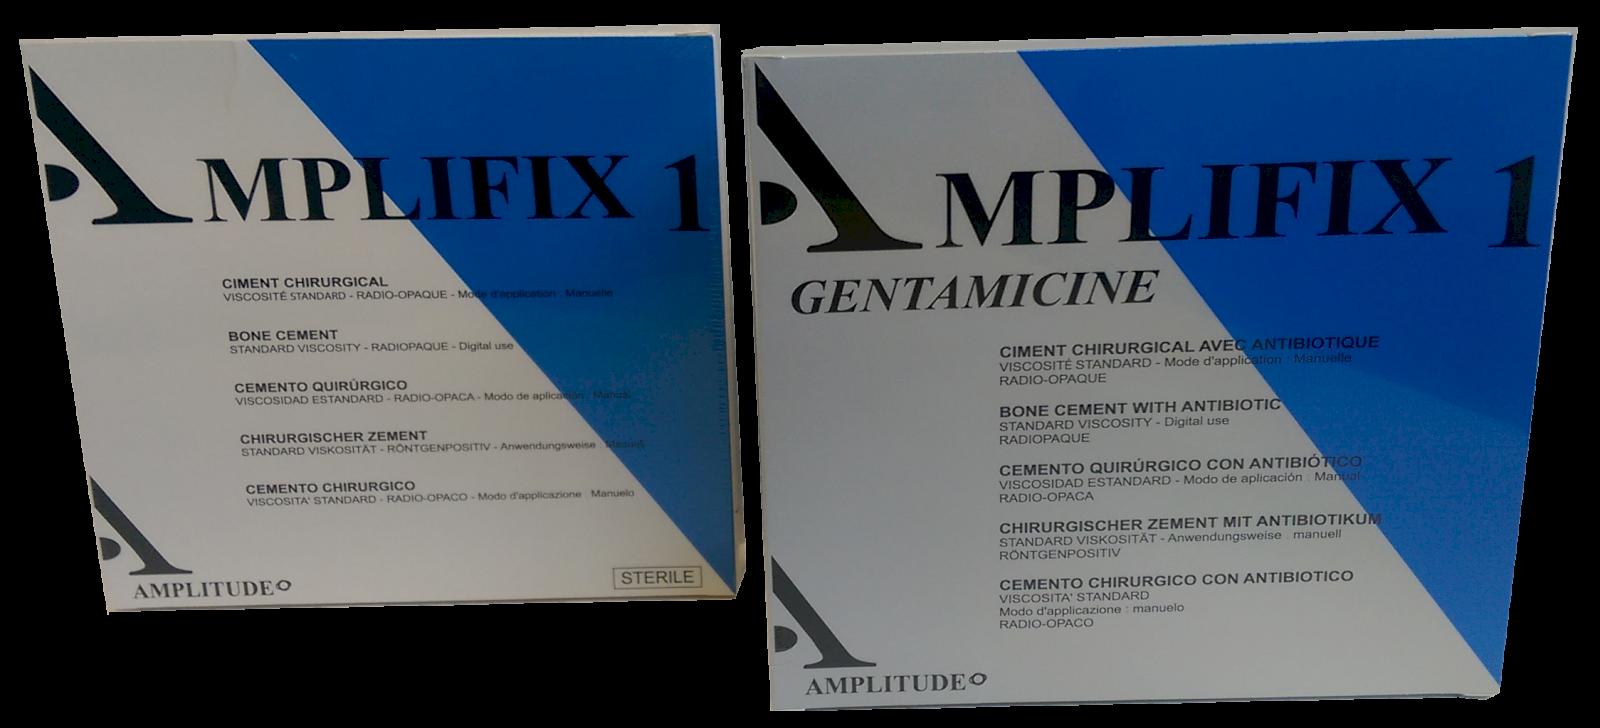 AMPLIFIX® 1 et AMPLIFIX® 1 avec Gentamicine